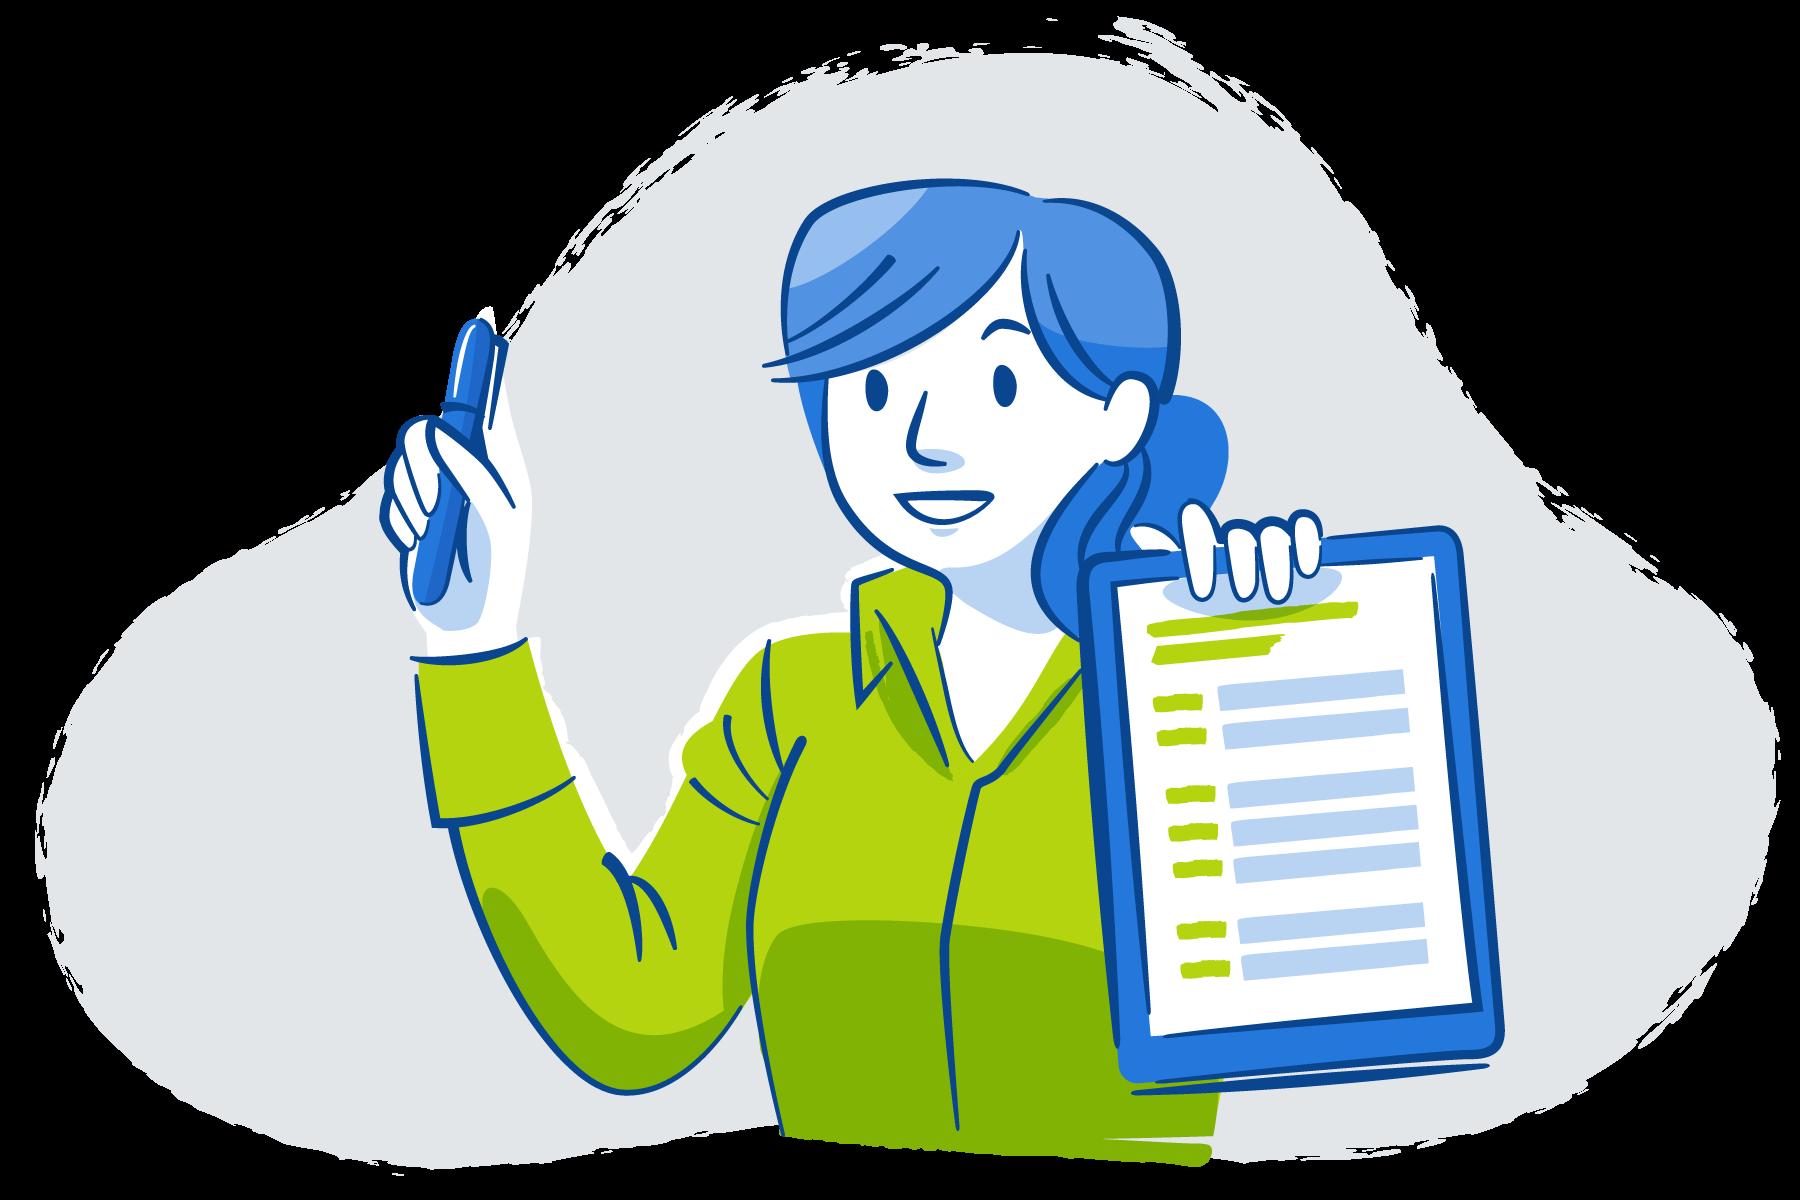 Illustration of woman holding CV checklist